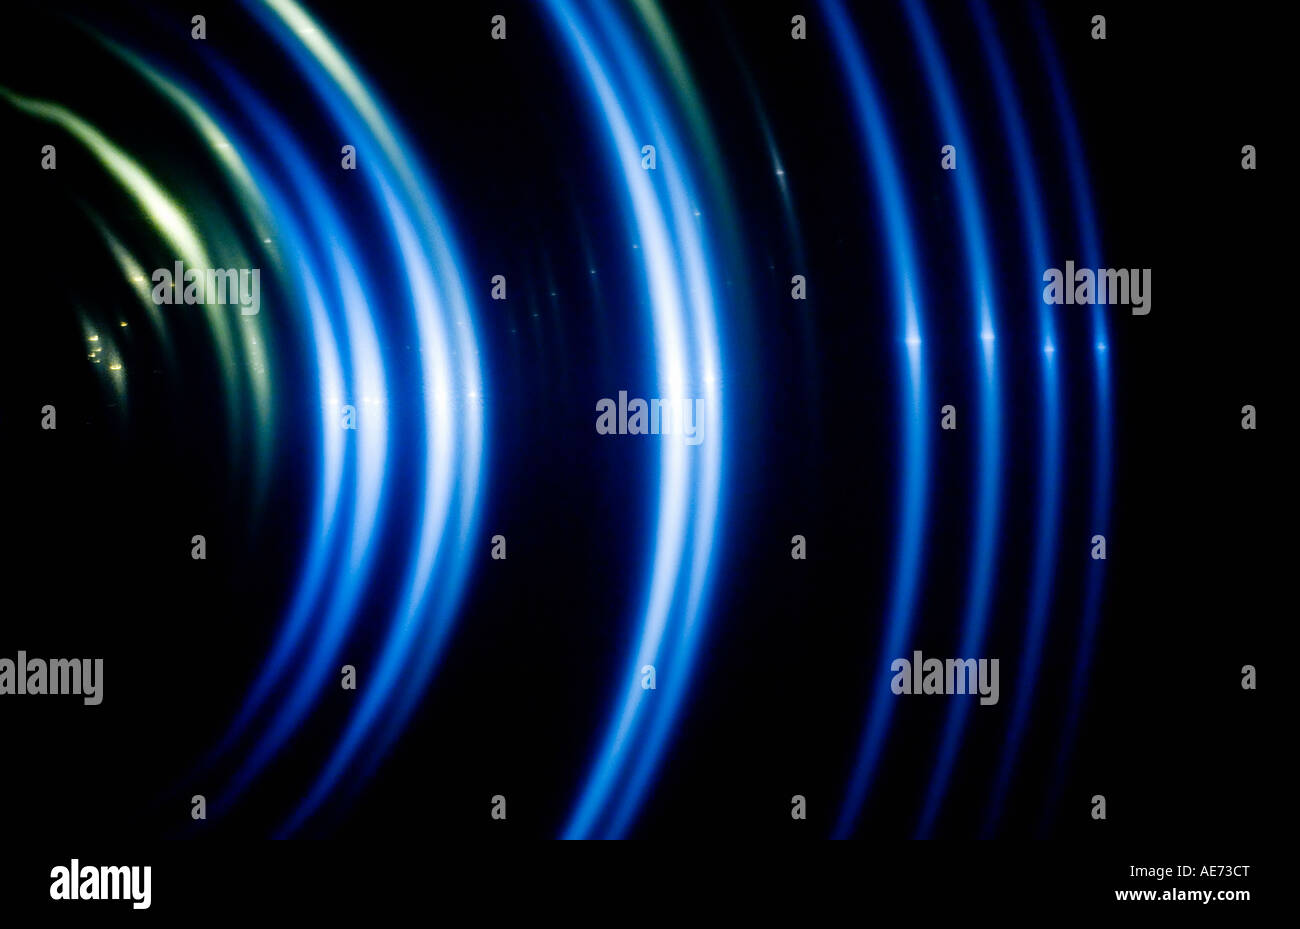 Radiating ripples of light. - Stock Image